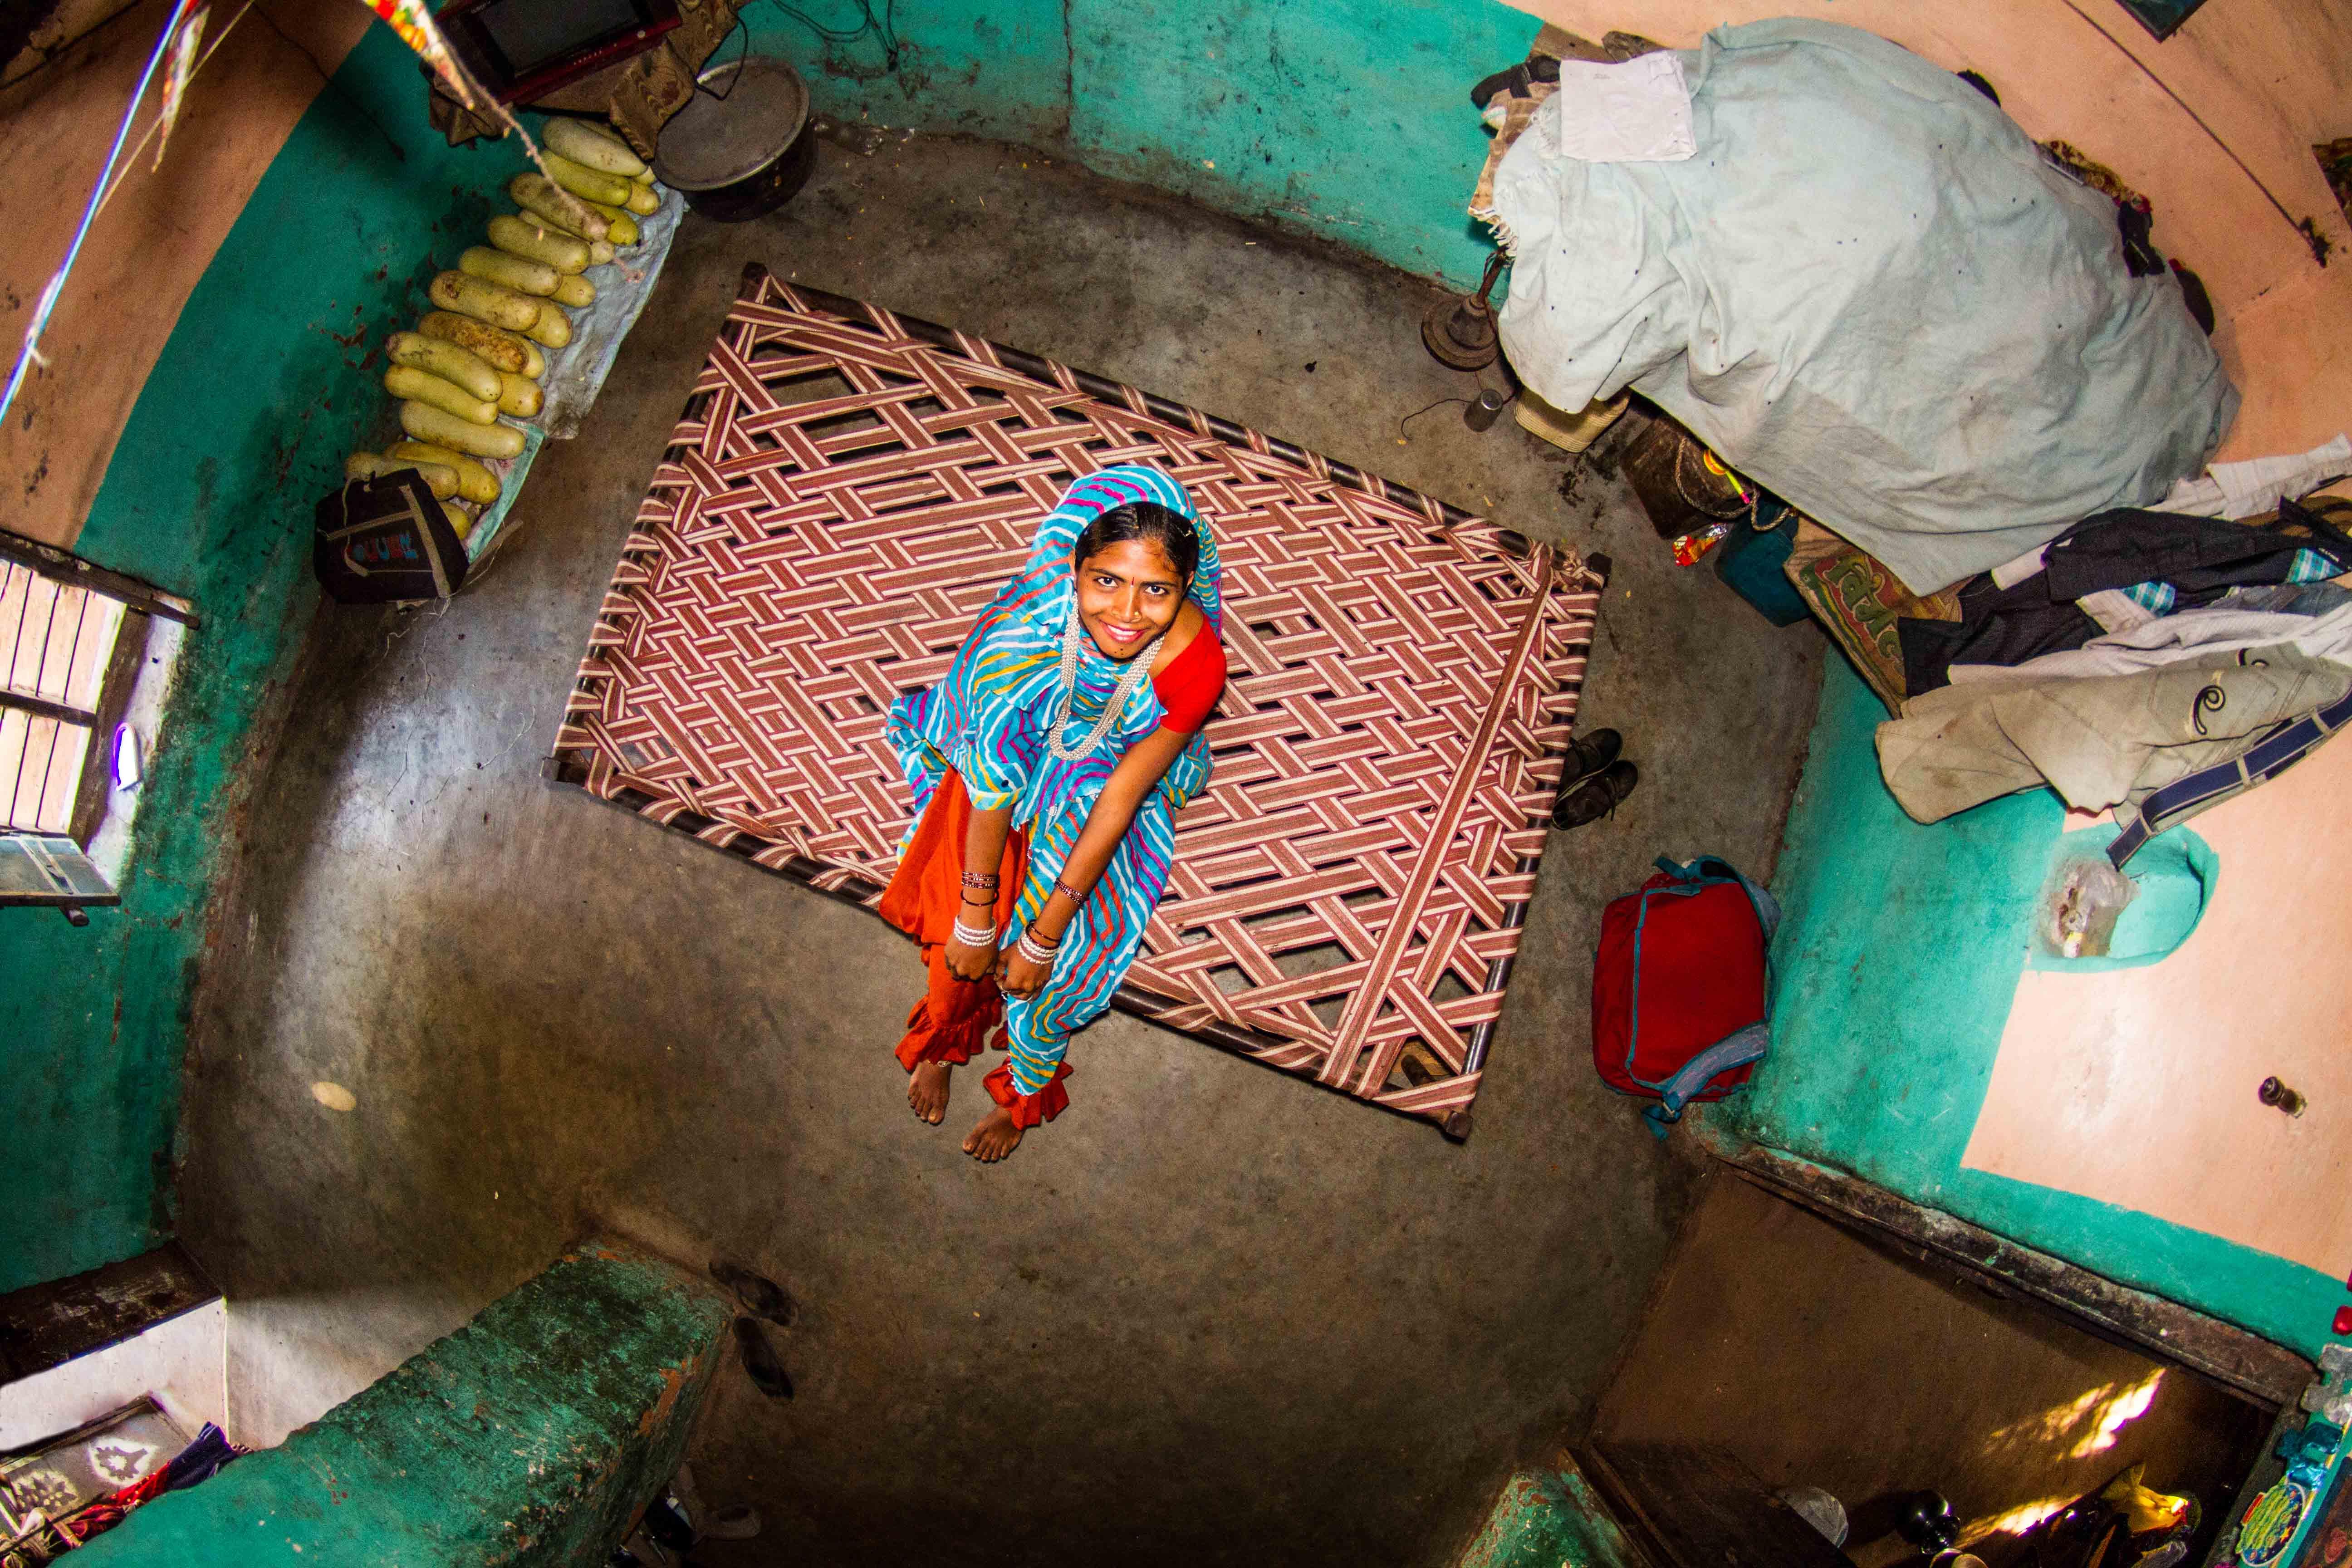 Asha, housewife, 17 years old, Bamansemilya, India.